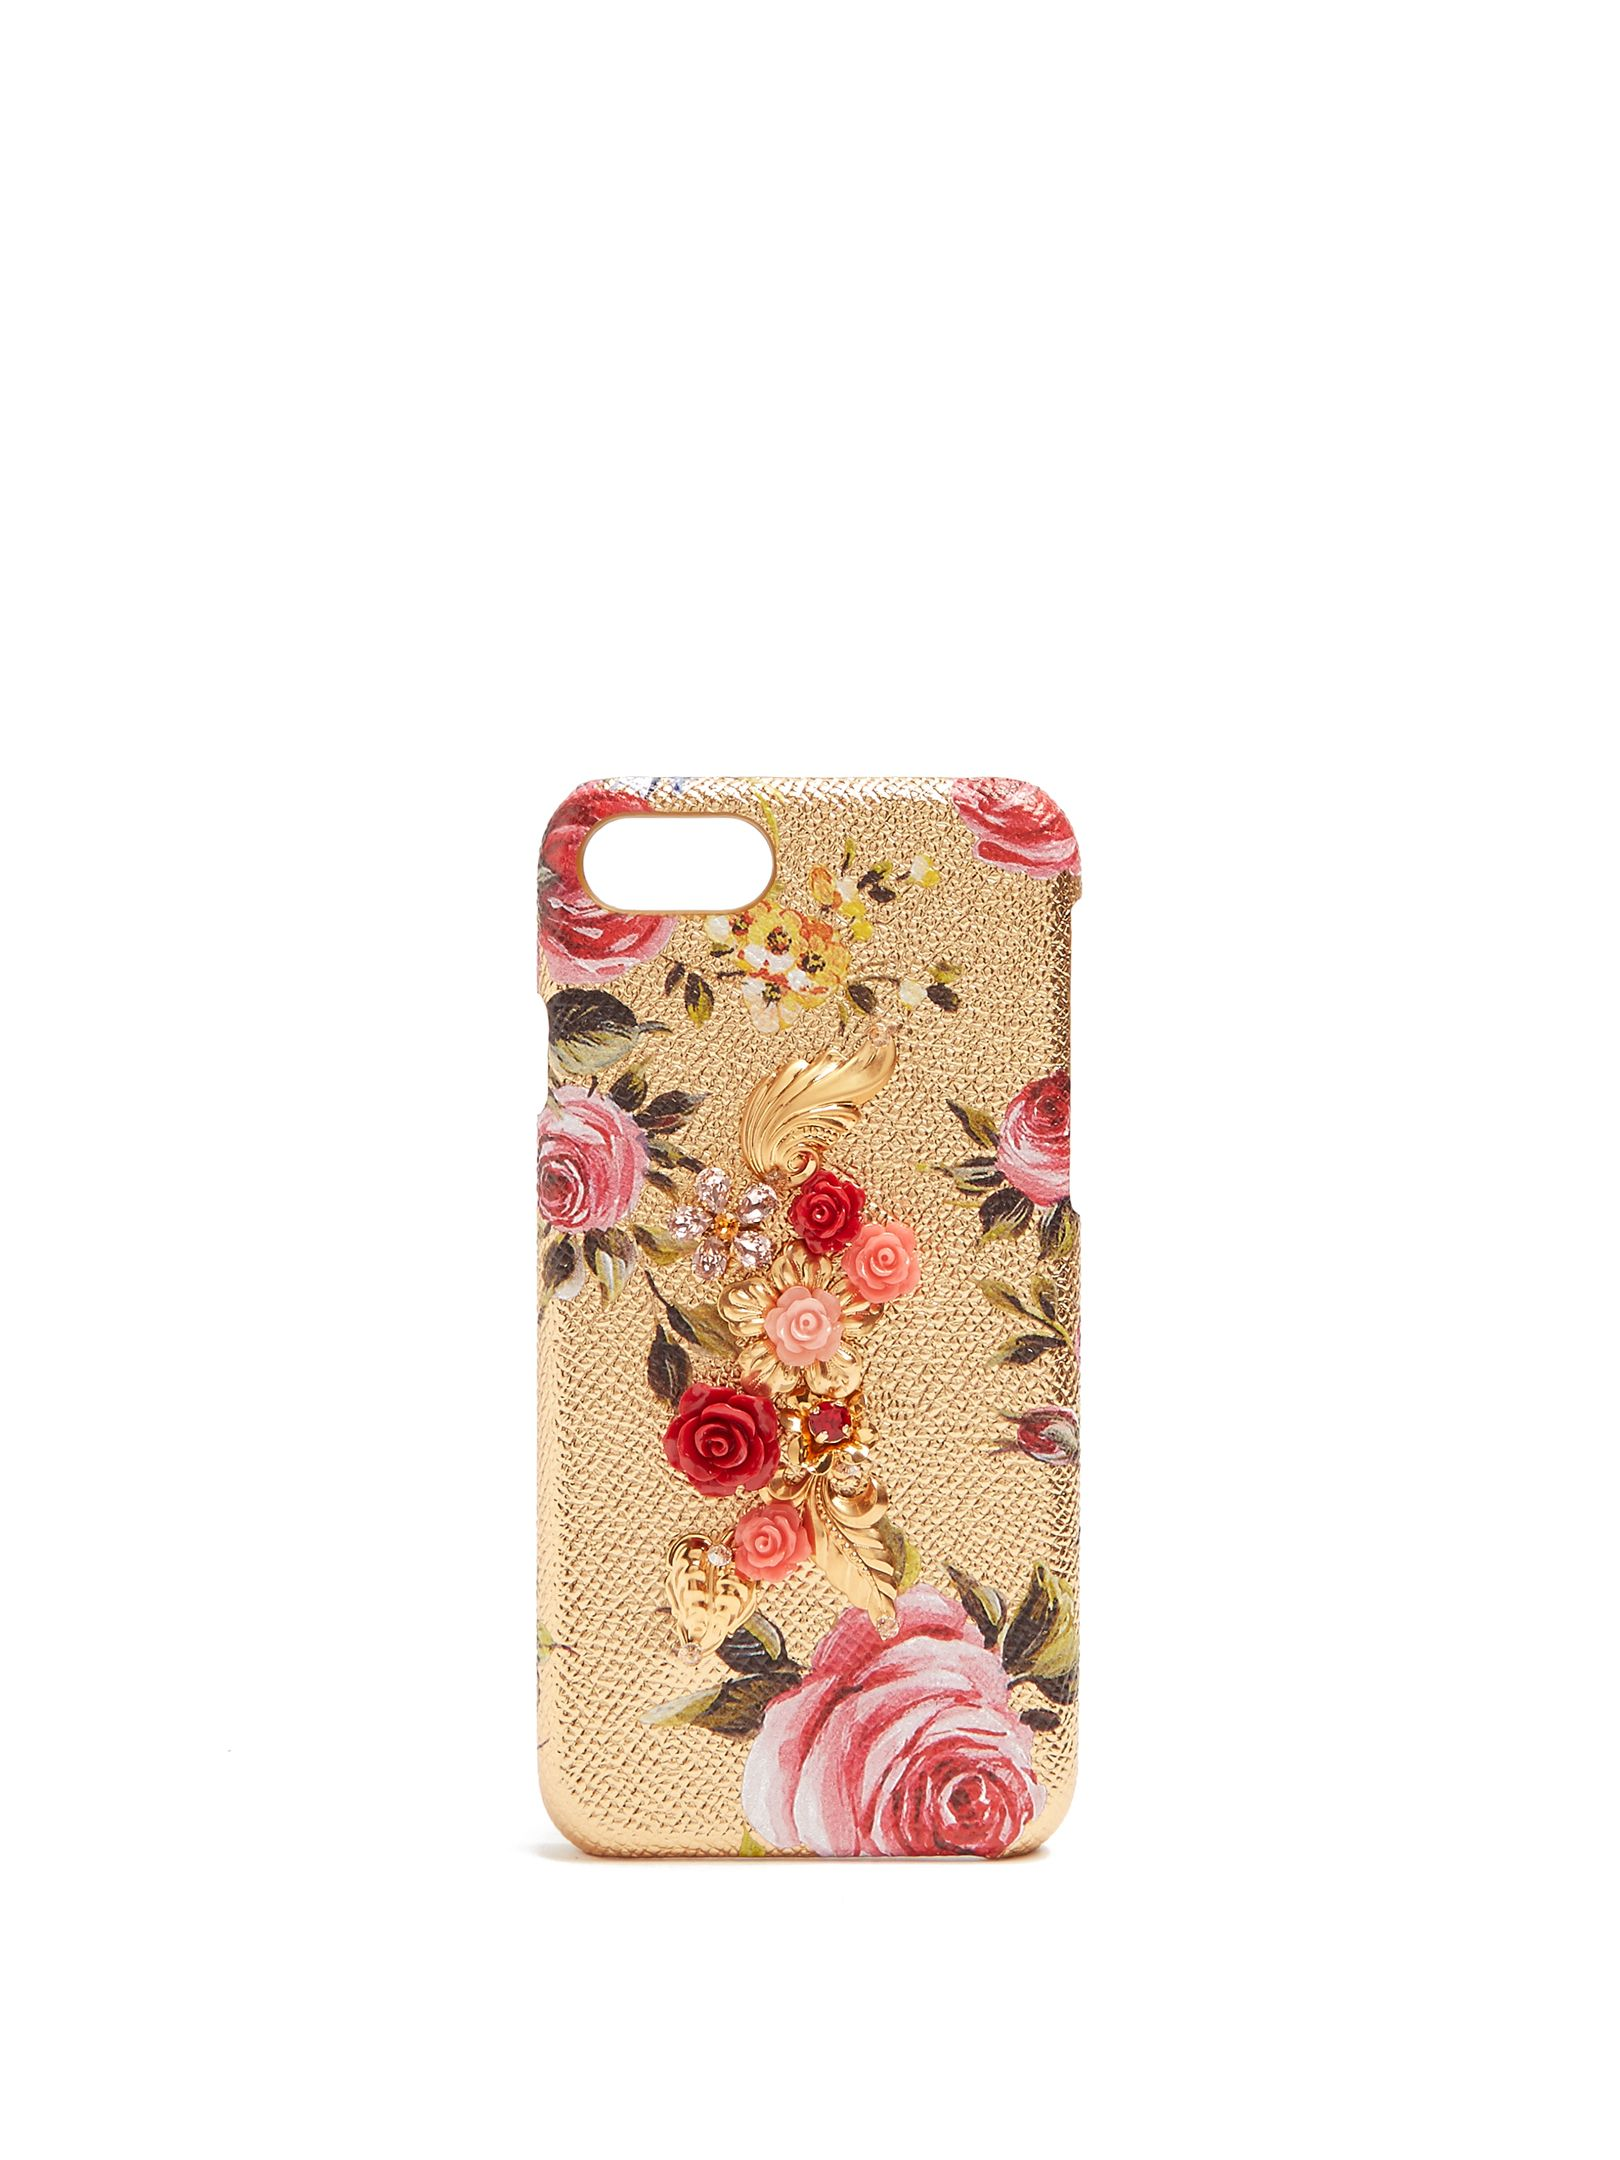 ed84f2e776 DOLCE & GABBANA Floral crystal-embellished iPhone® 6 case   Fashion ...